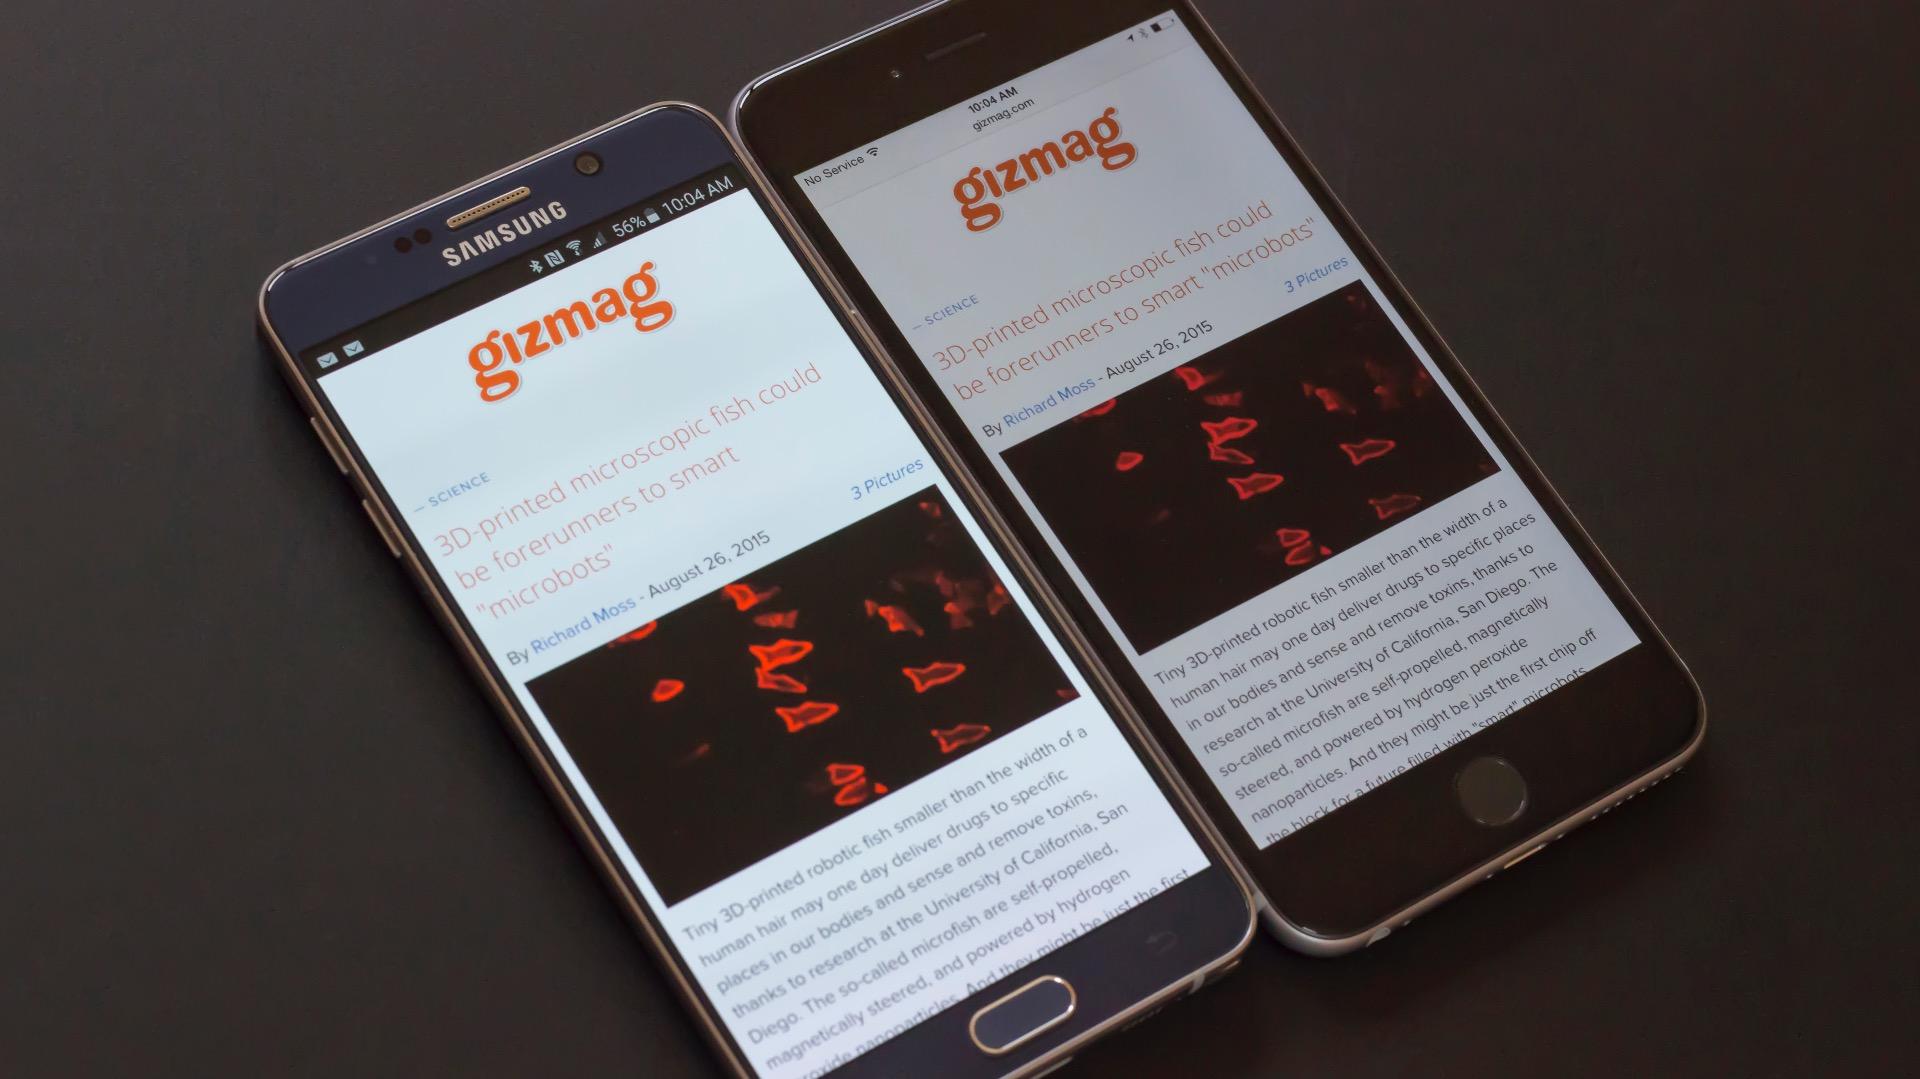 Gadget tech explained: AMOLED vs  IPS displays